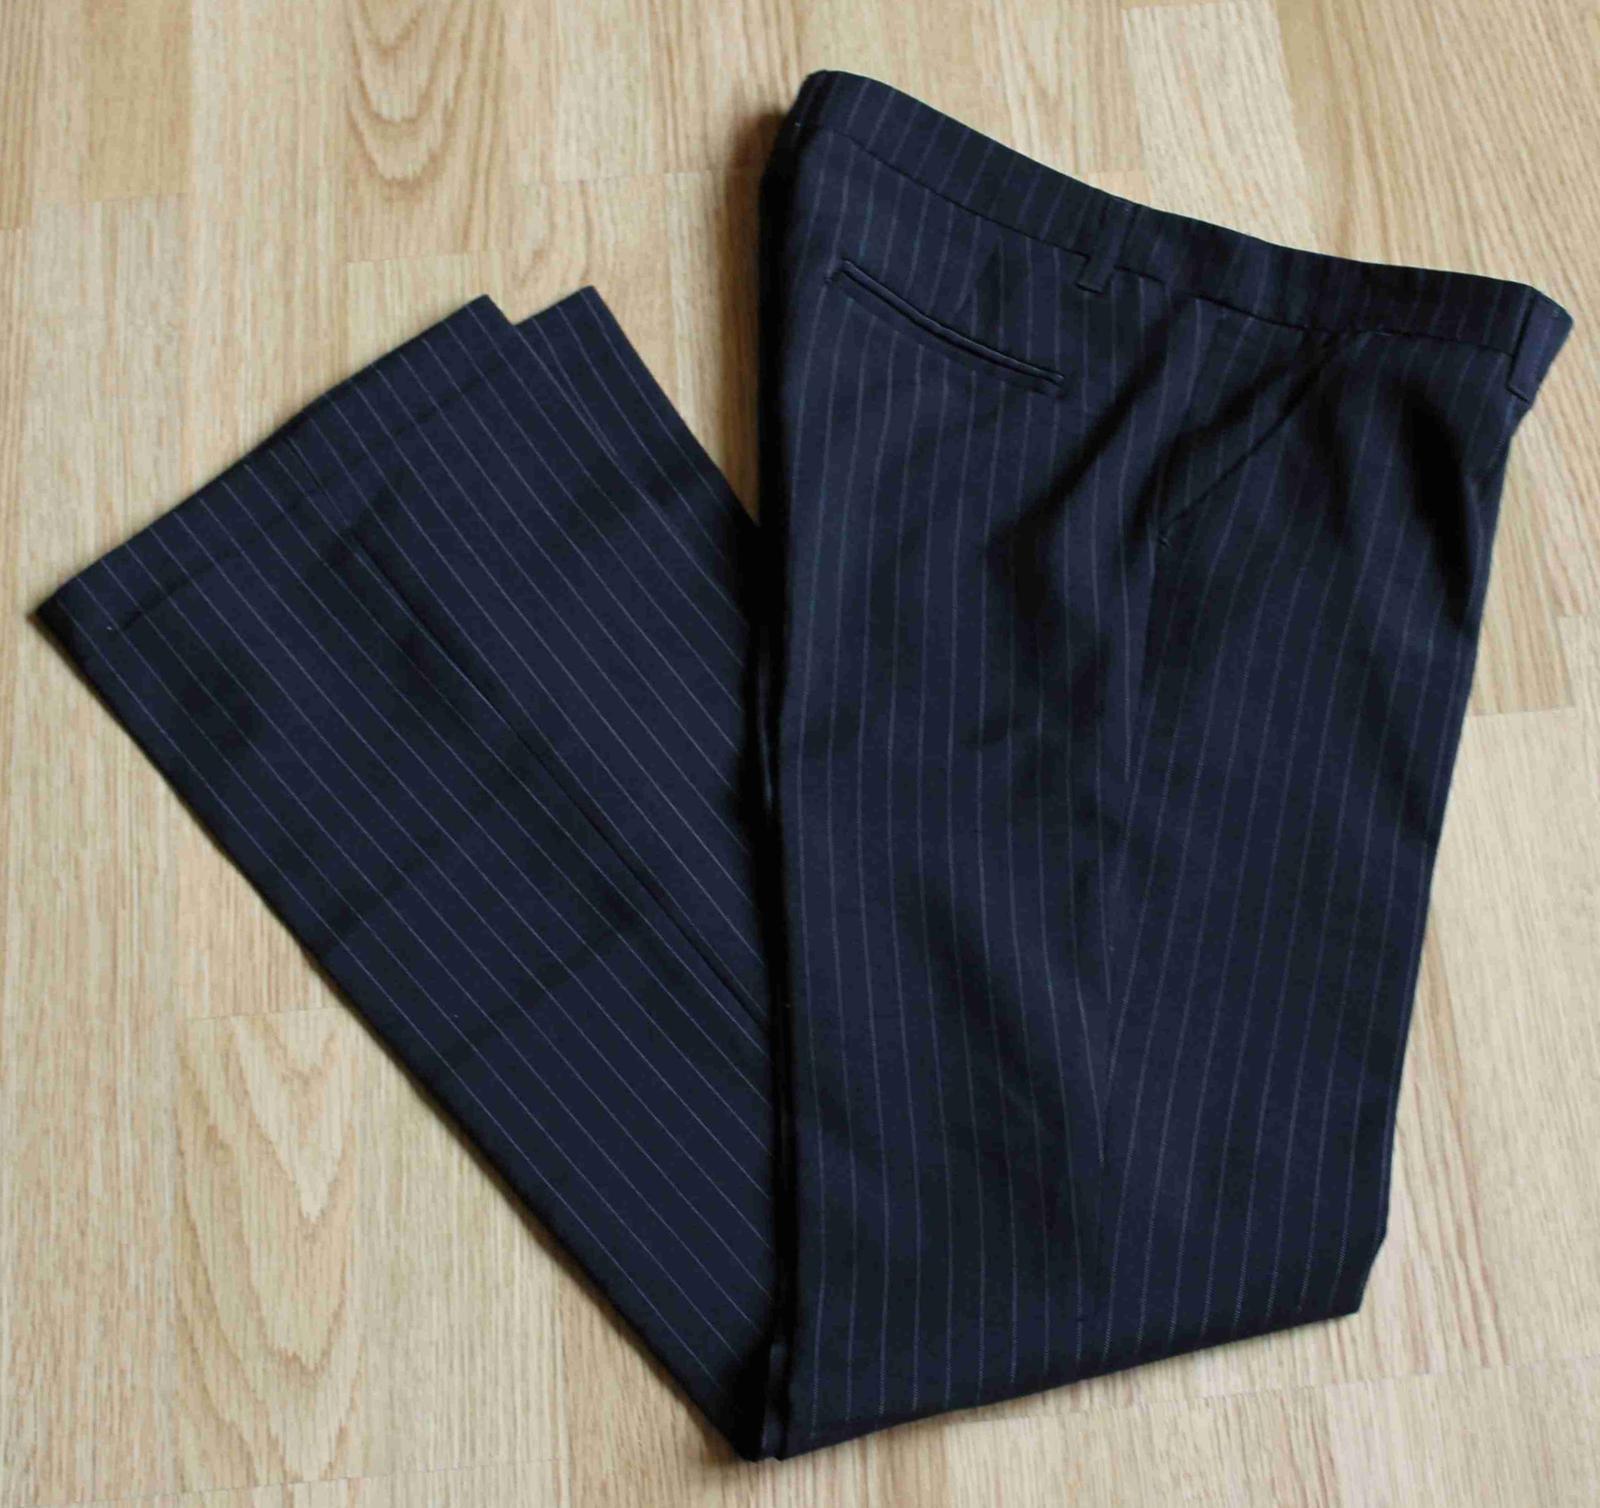 Elegantné nohavice - Obrázok č. 1